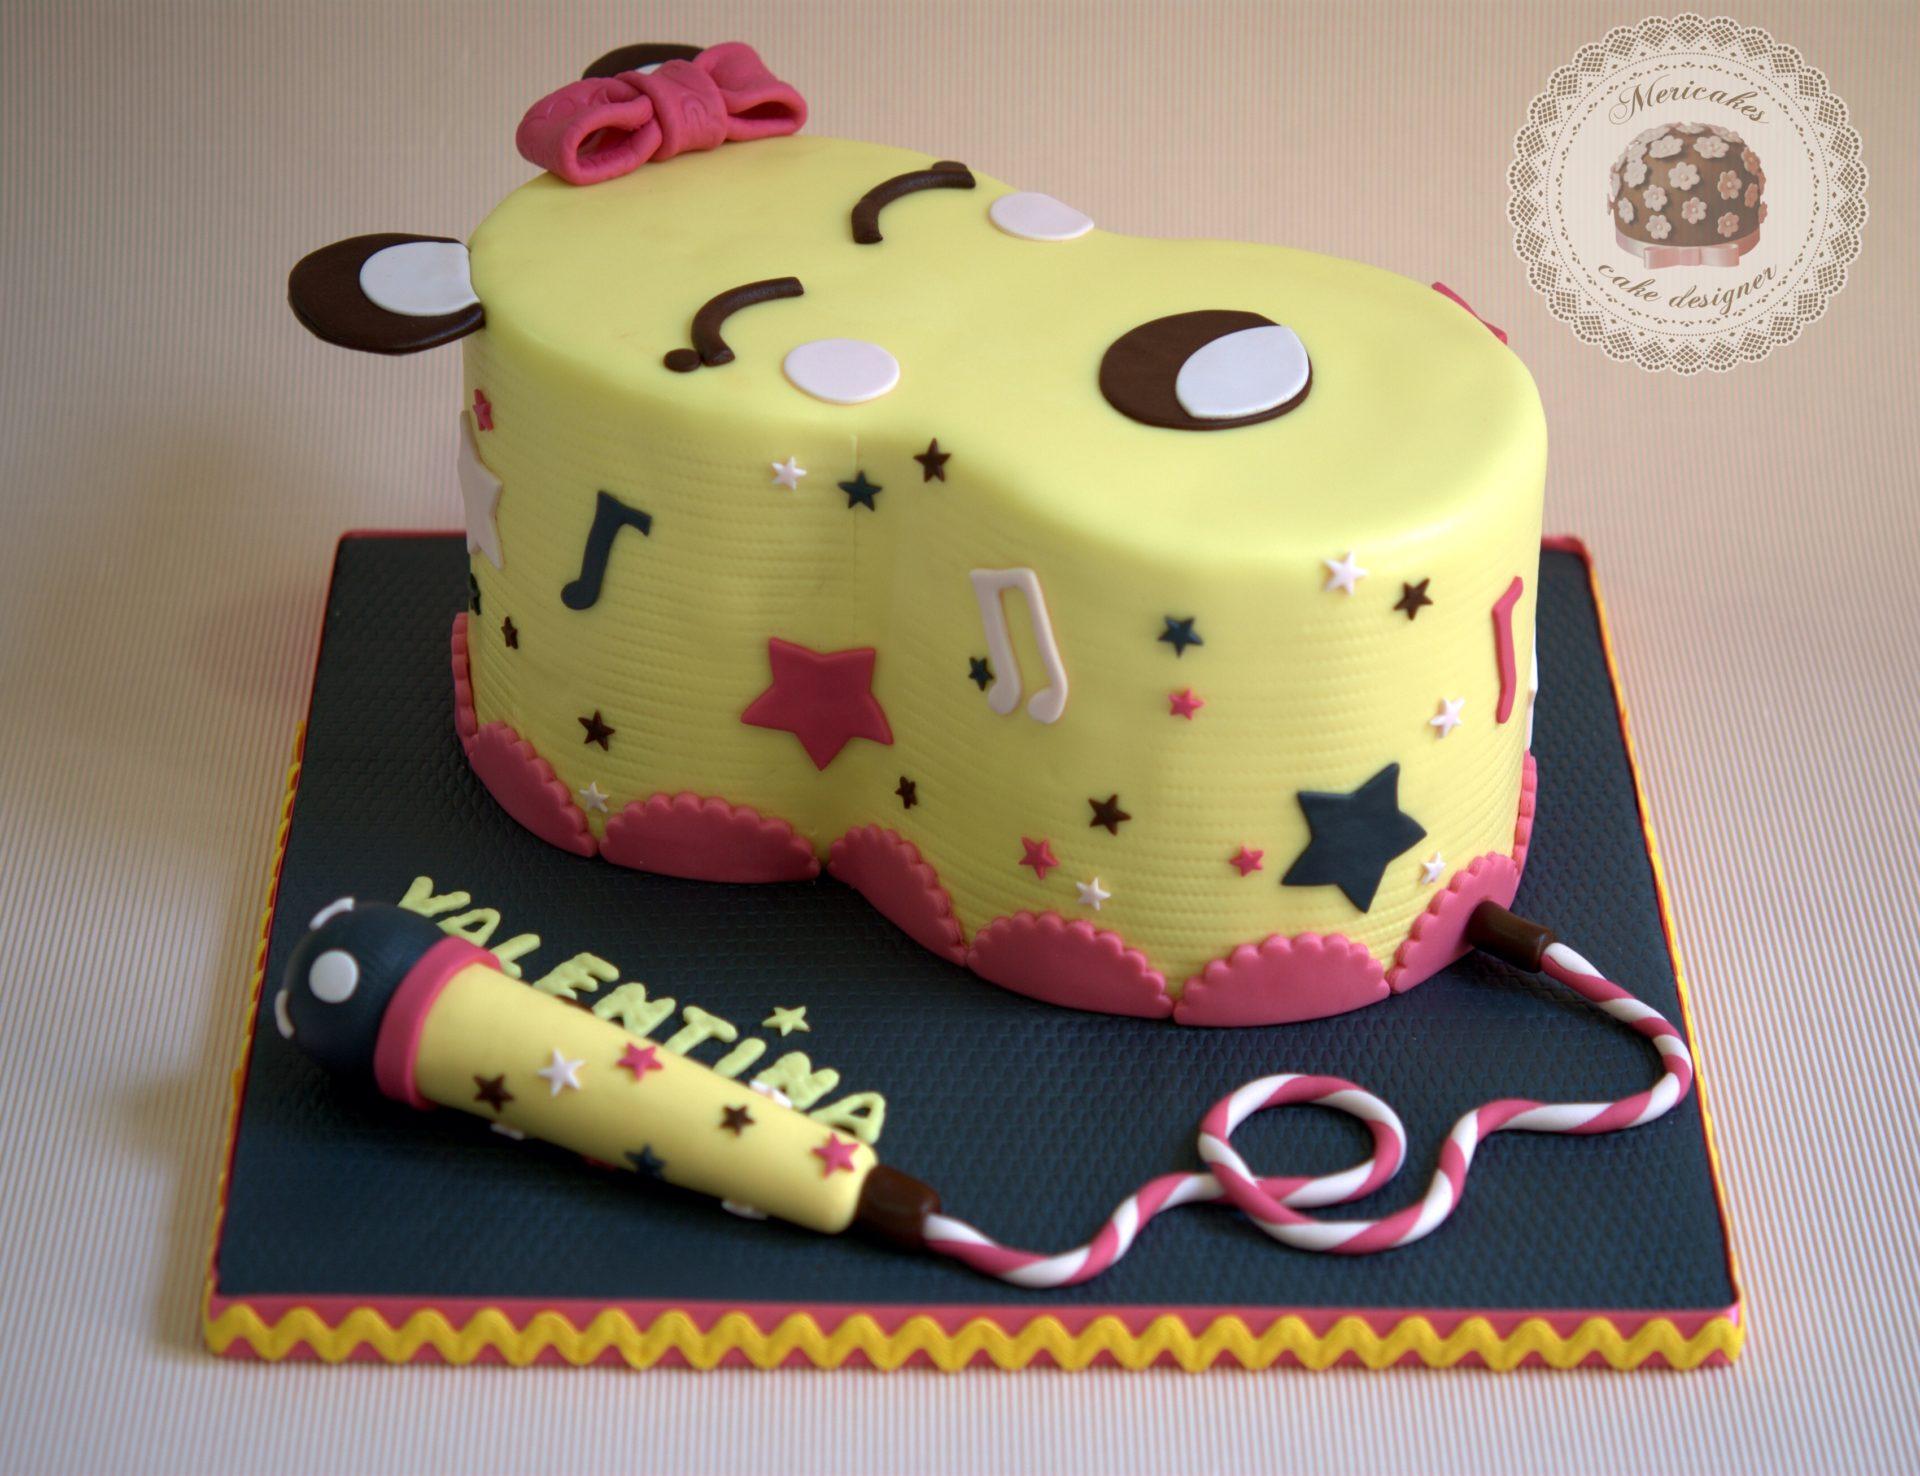 tarta-ocho-kawaii-eight-rainbow-cake-microfono-barcelona-naranja-chocolate-mericakes-fondant